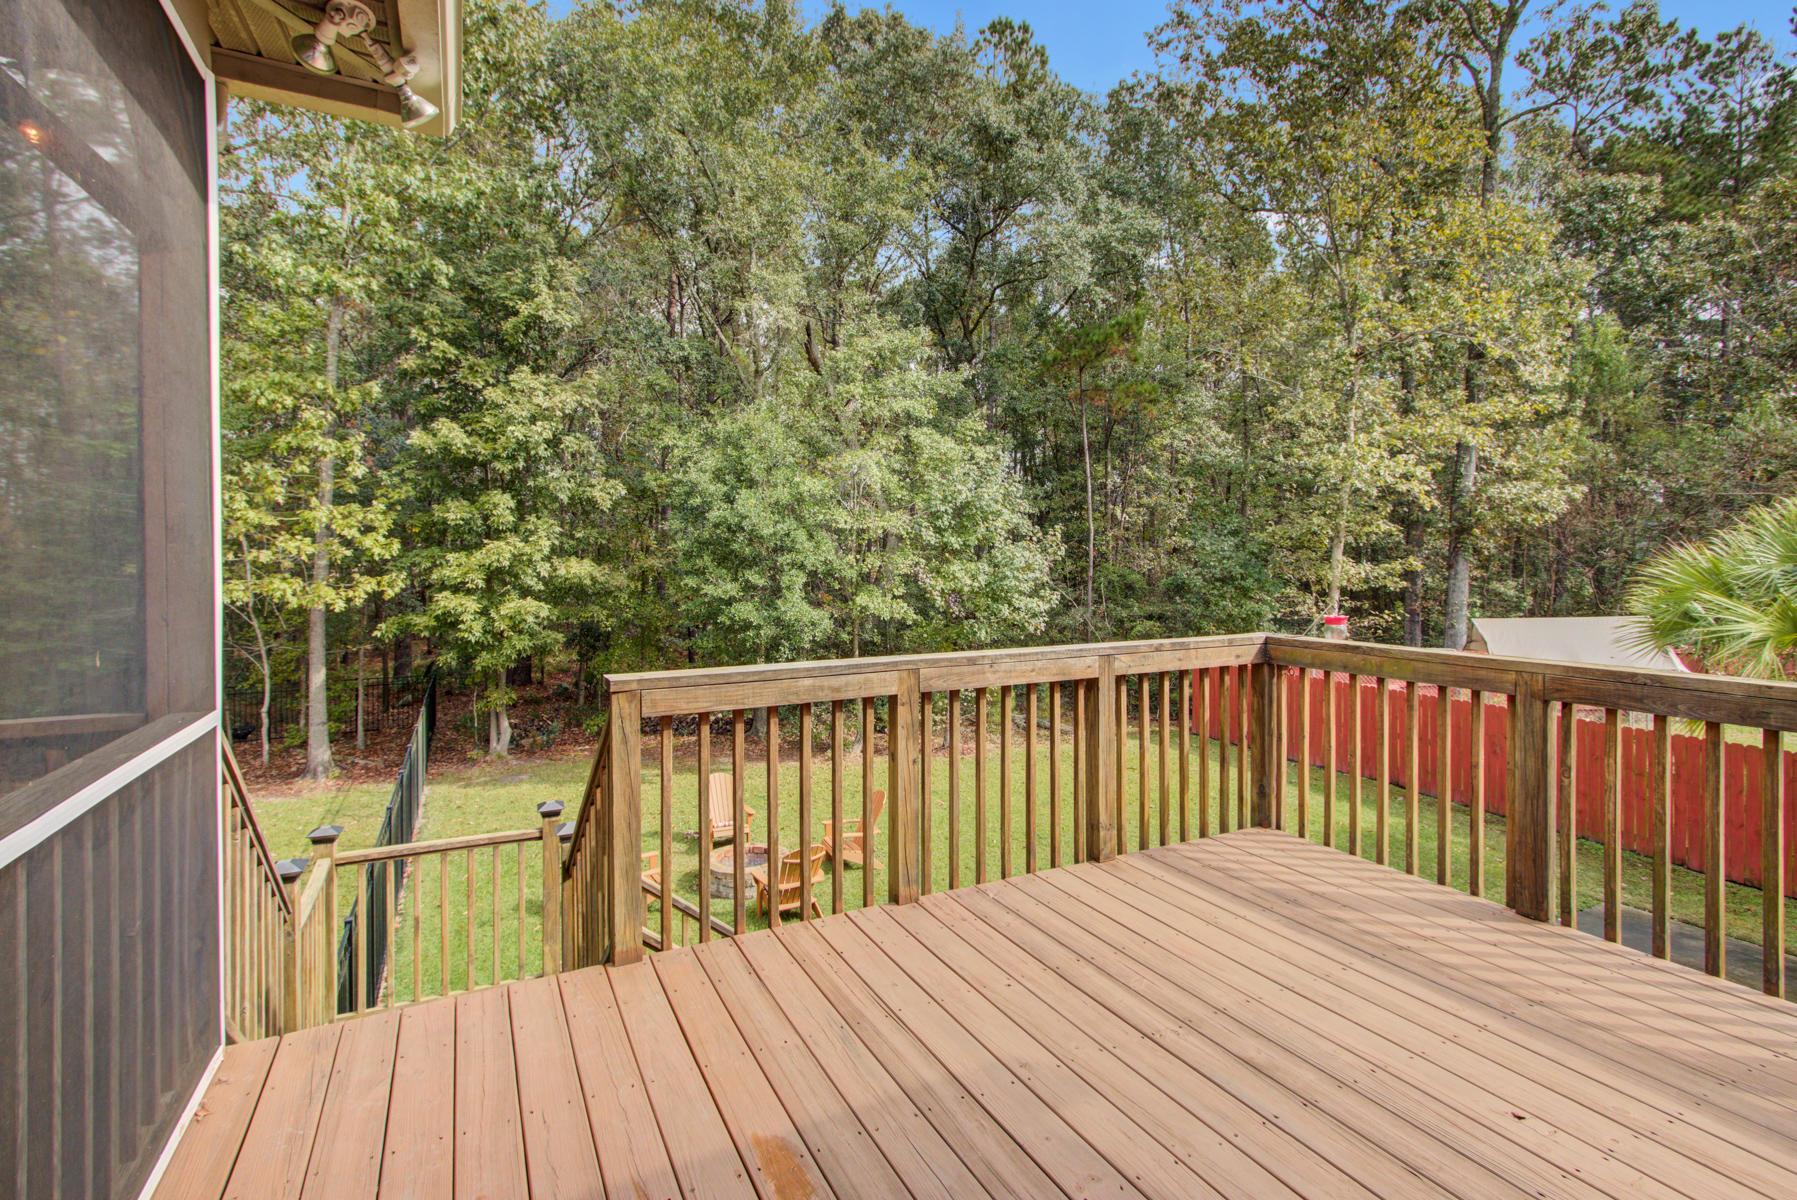 Cedar Grove Homes For Sale - 8733 Millerville, North Charleston, SC - 35